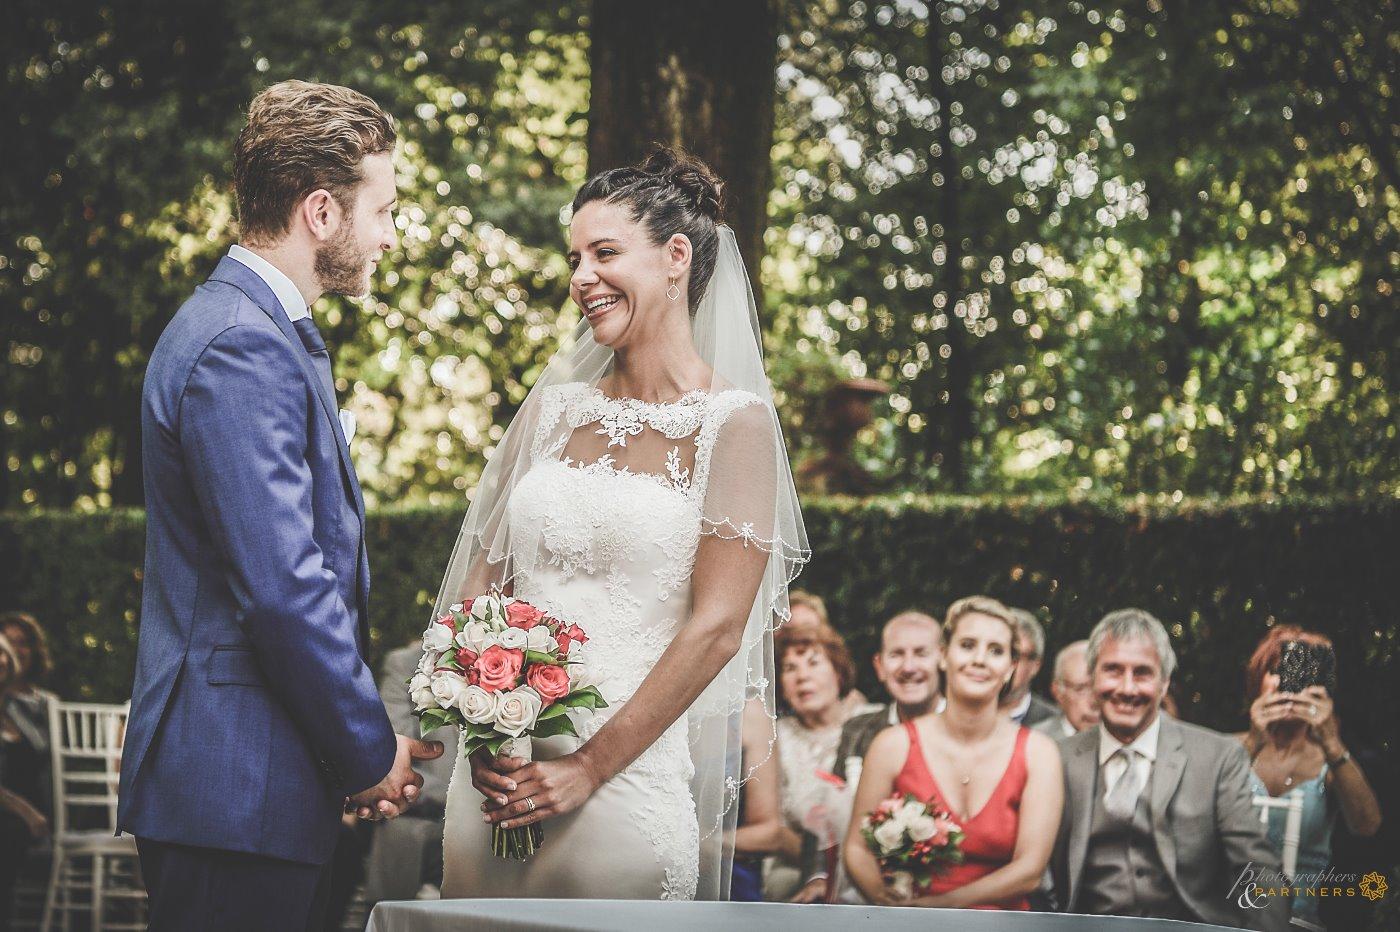 photography_weddings_villa_grabau_04.jpg